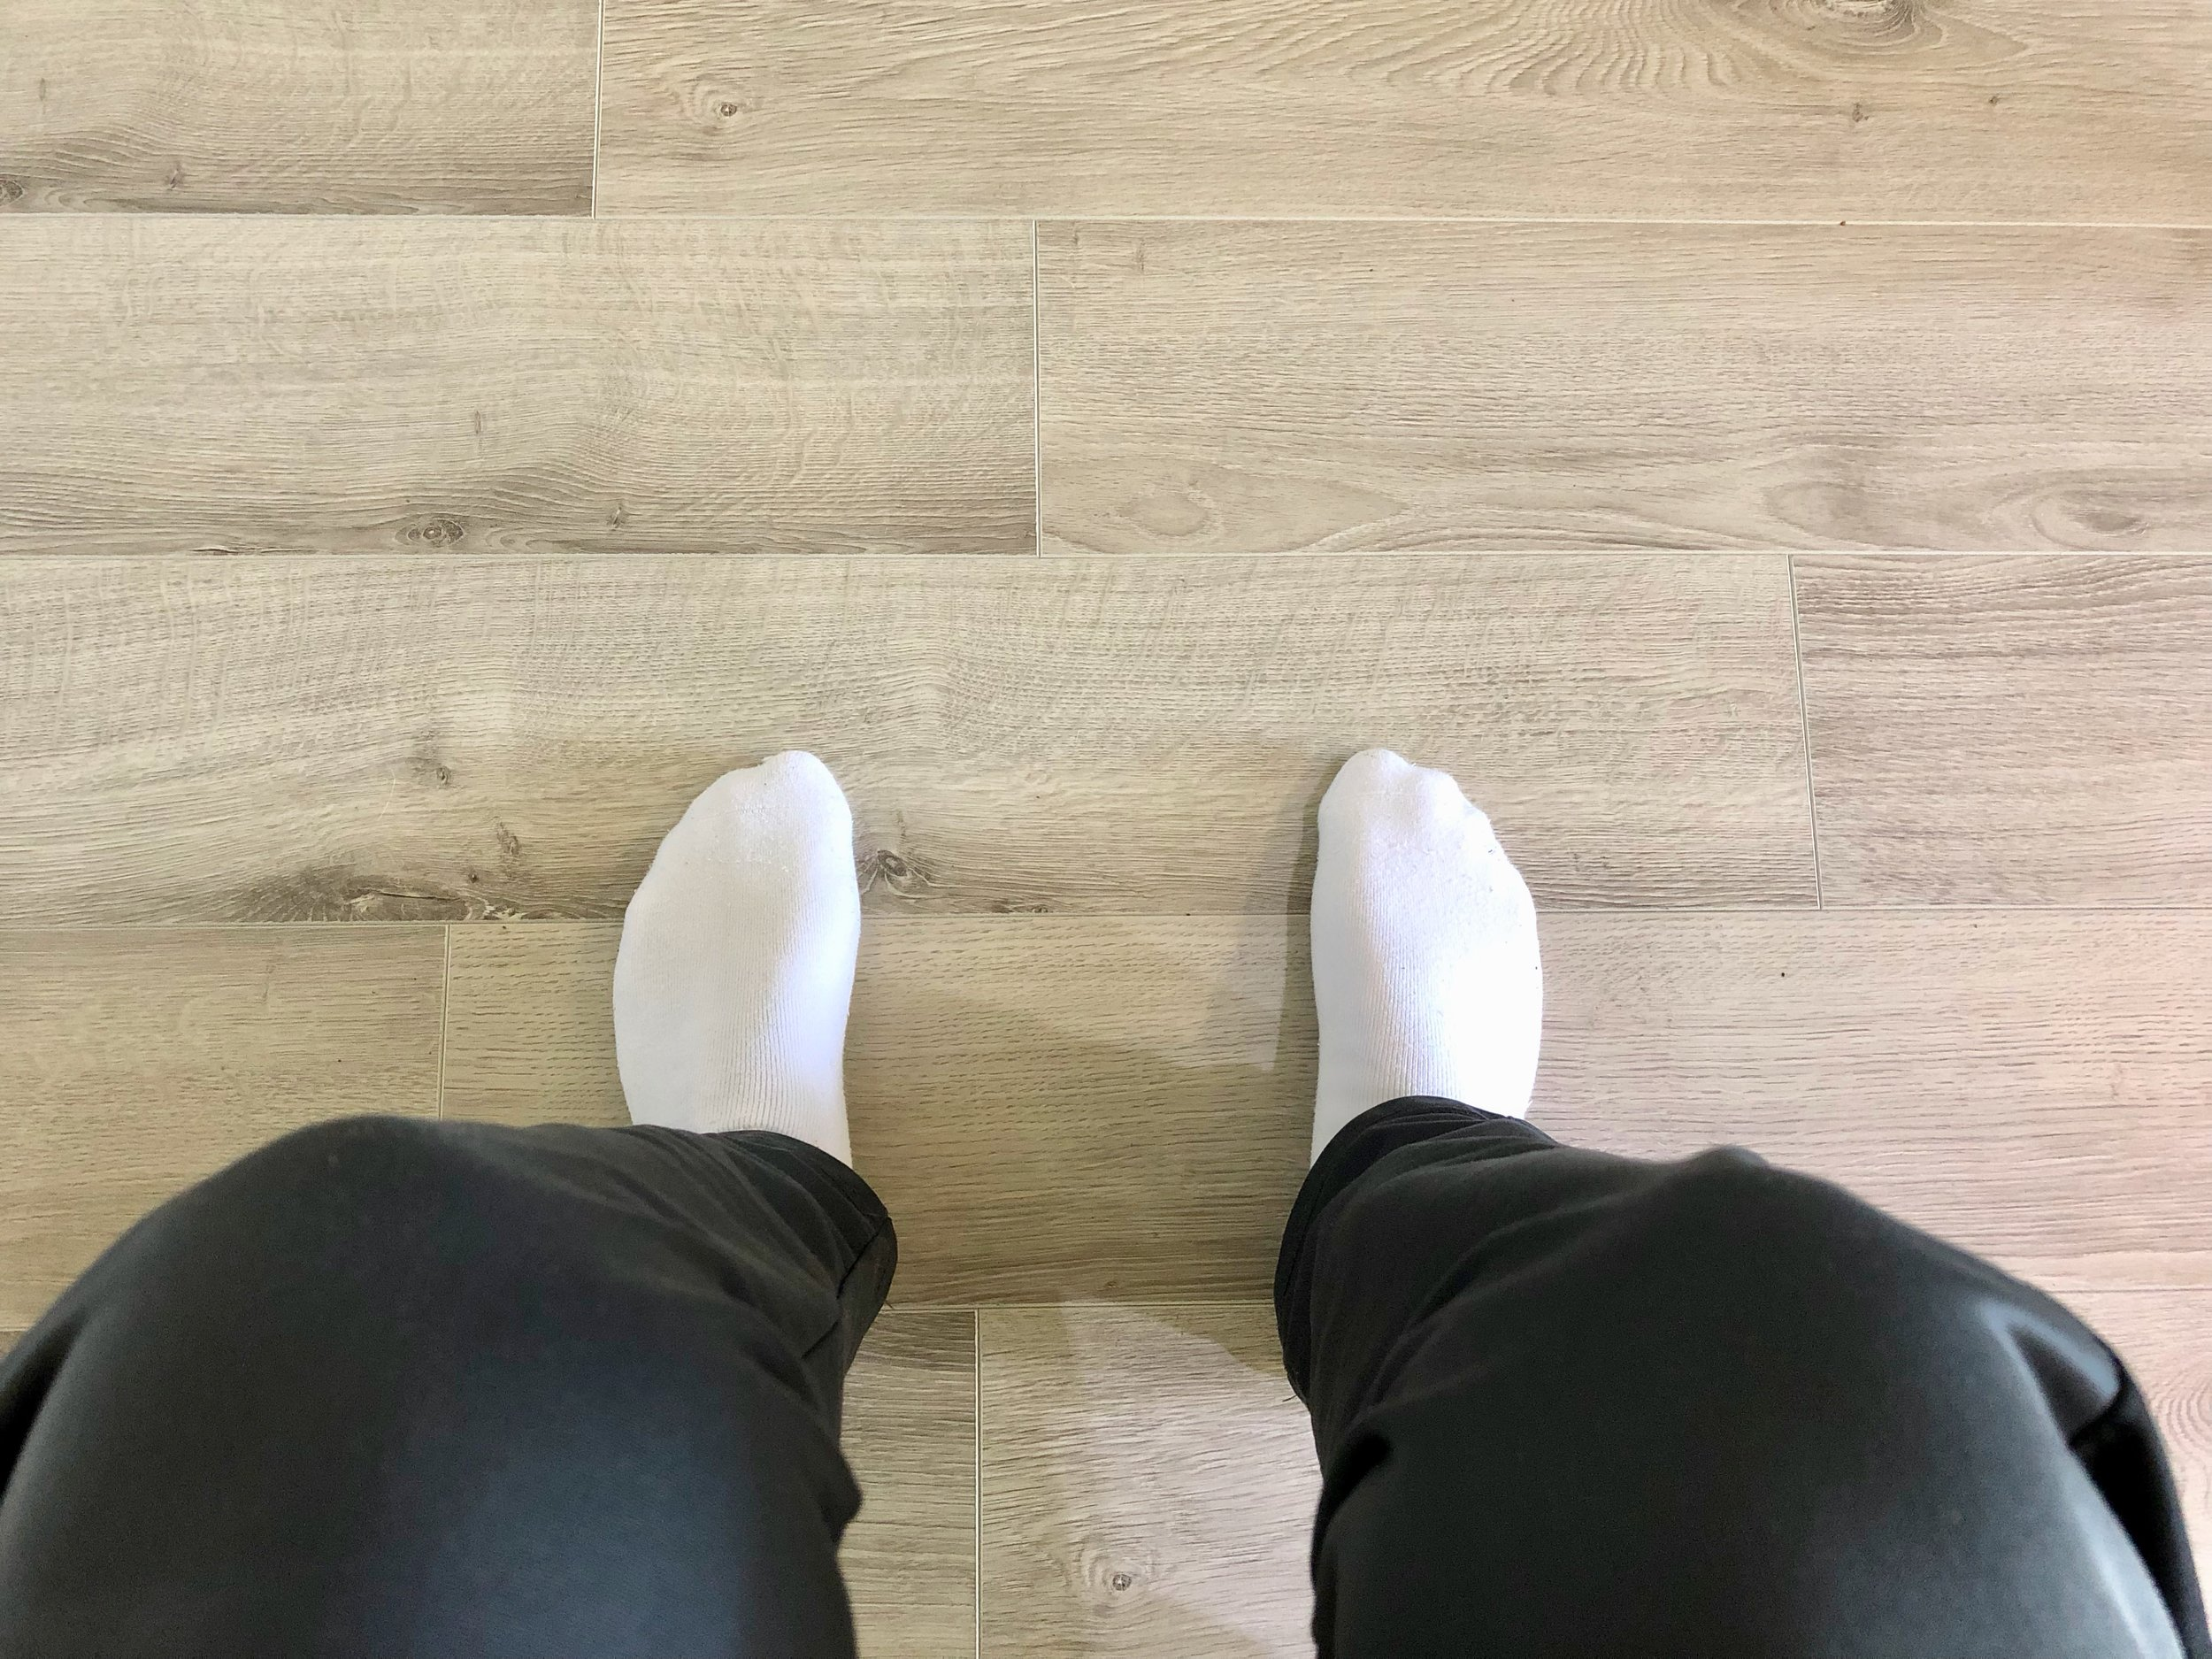 Feet_Flat_on_ground.jpg